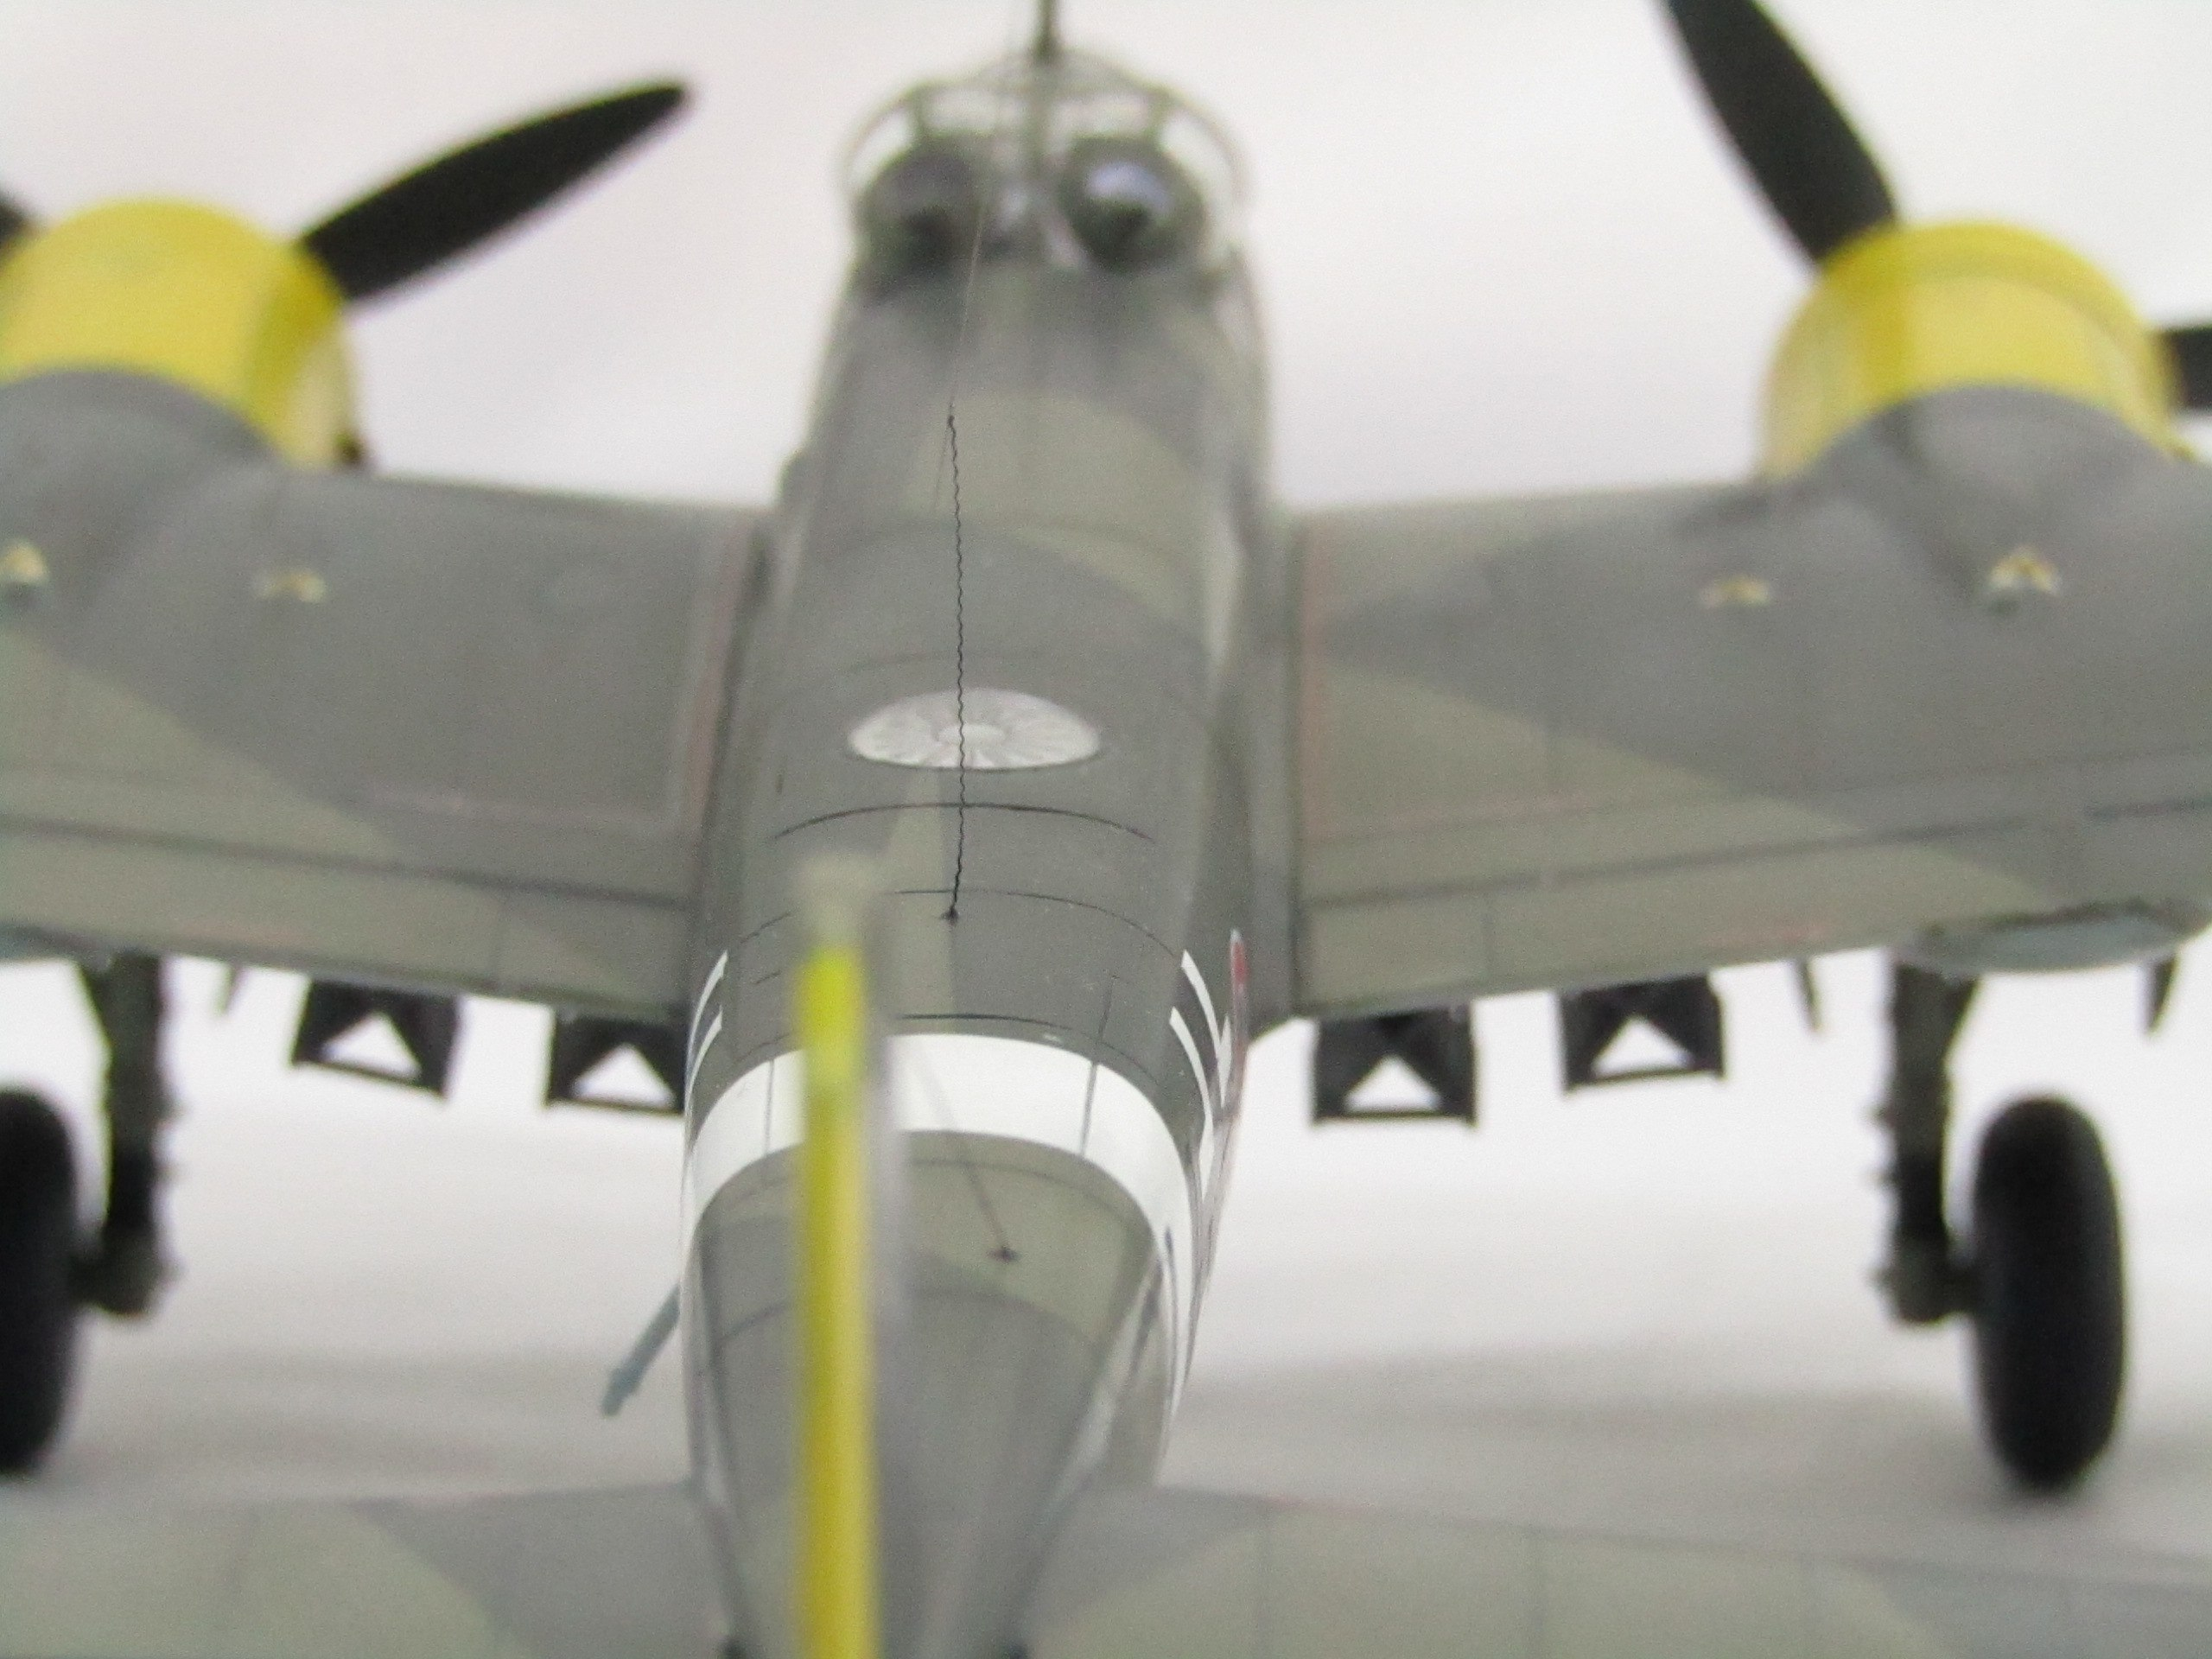 Ju-88 A-4 1/72 (Звезда) 6DjJPwtwlvk